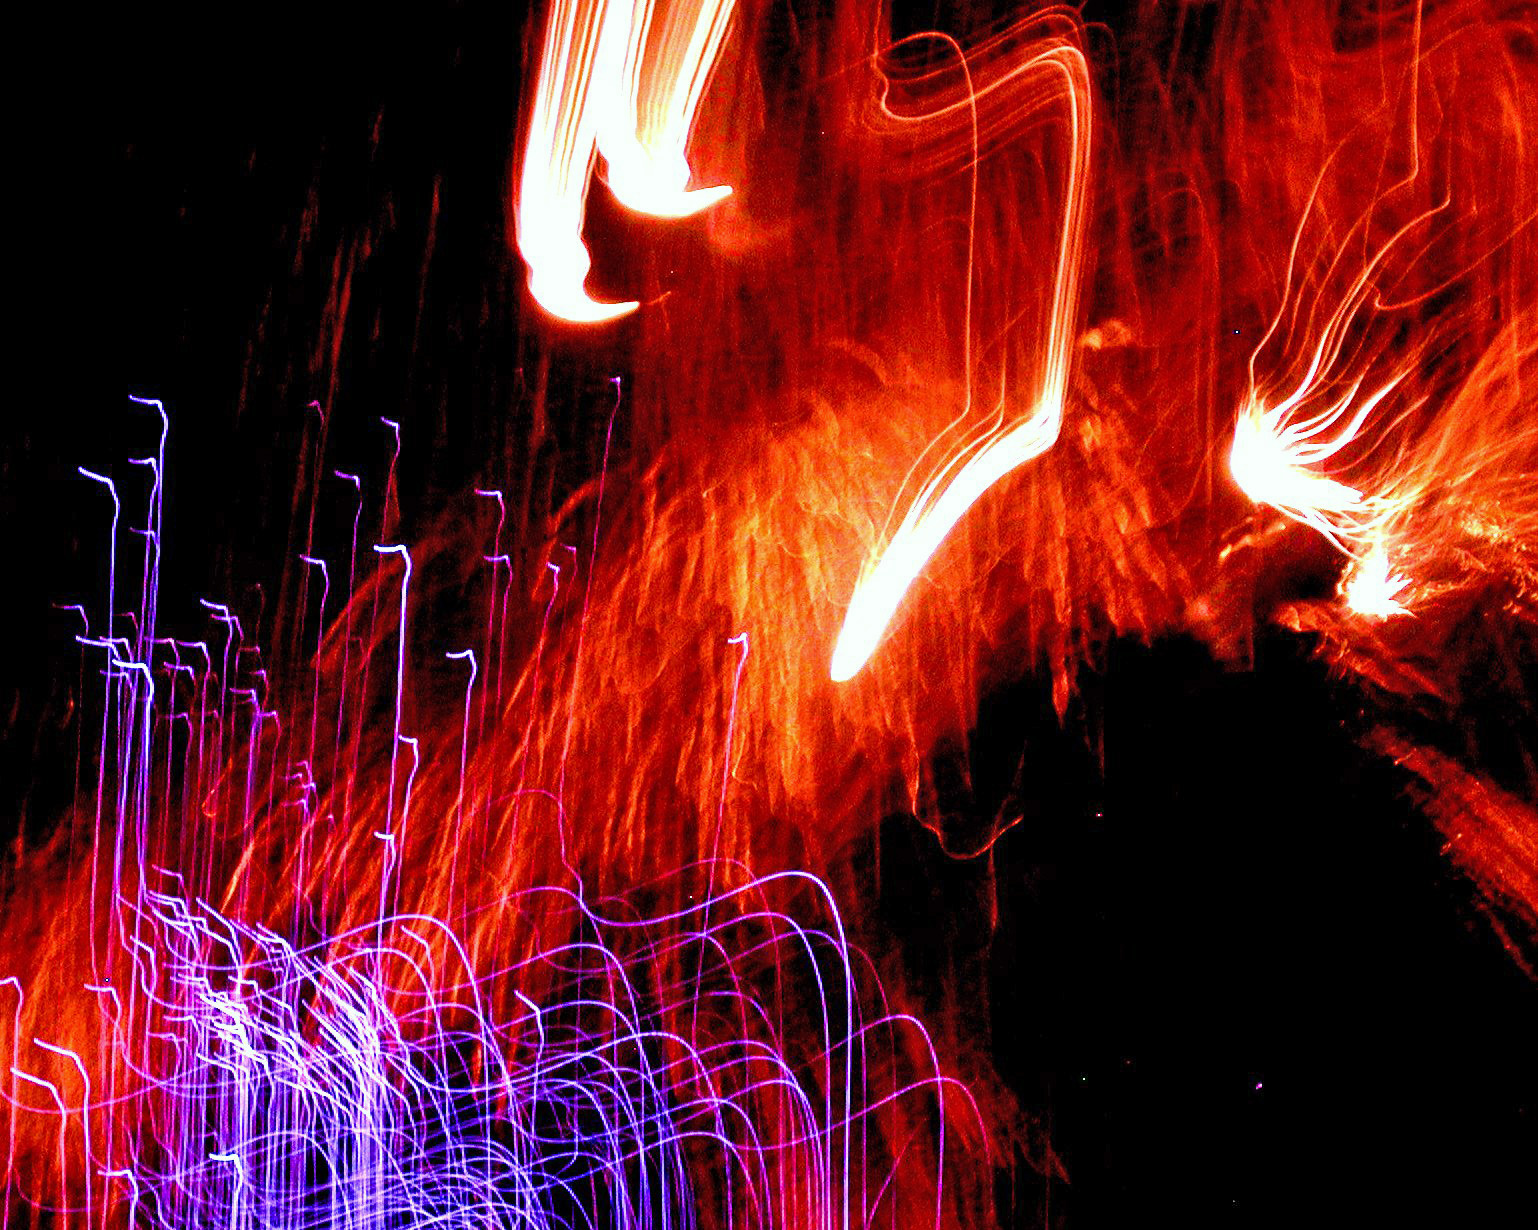 Fireworks 1 by Elfowlgirl